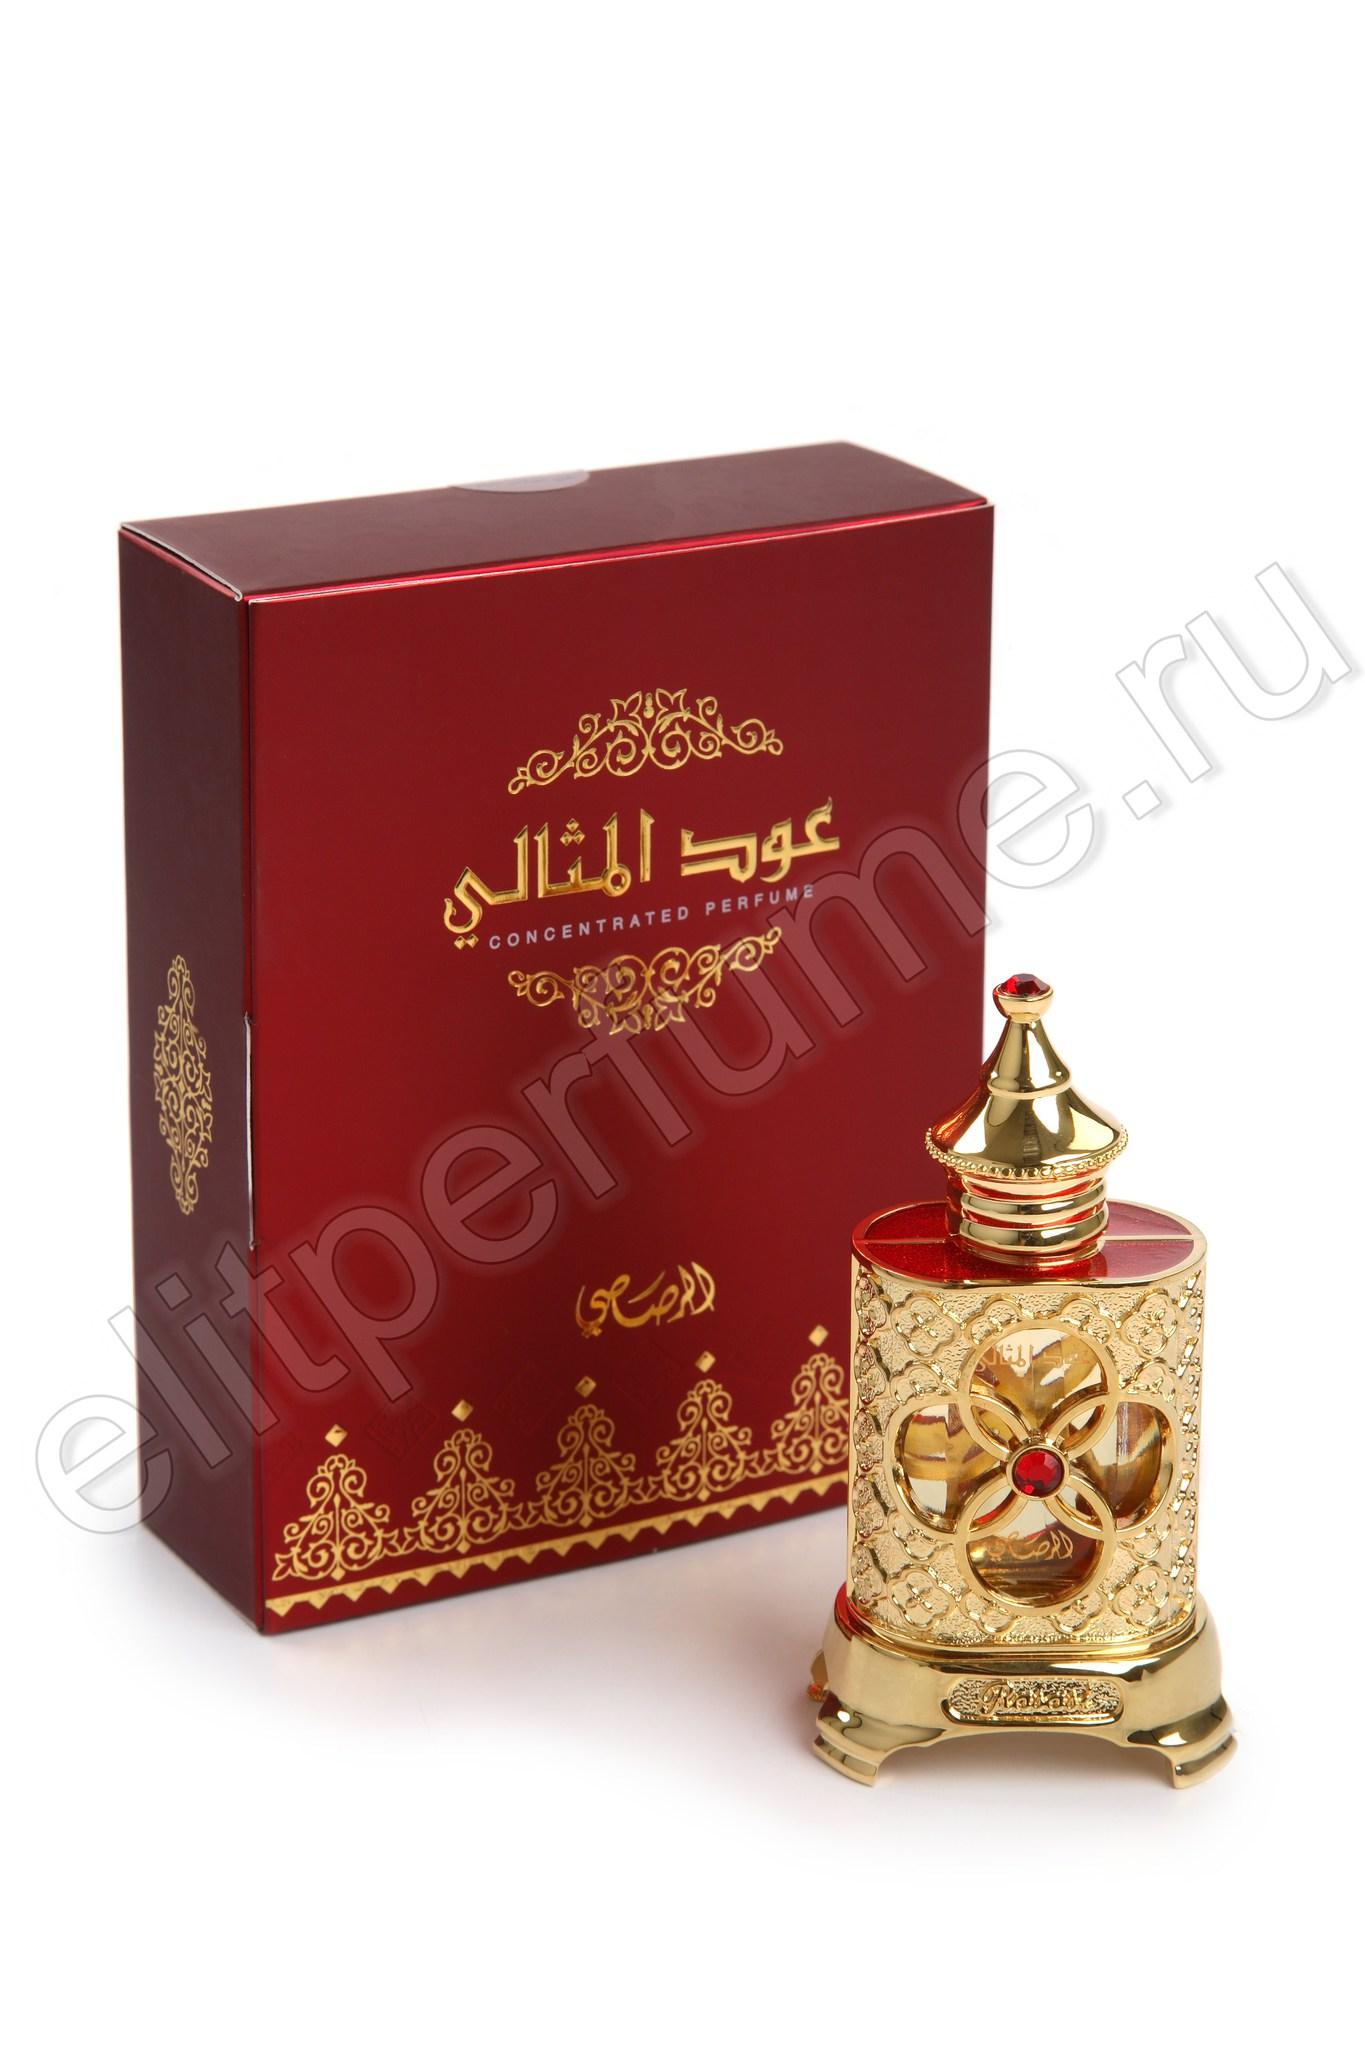 Пробники для духов Уд Аль Метали Oudh Almethali 1 мл арабские масляные духи от Расаси Rasasi Perfumes